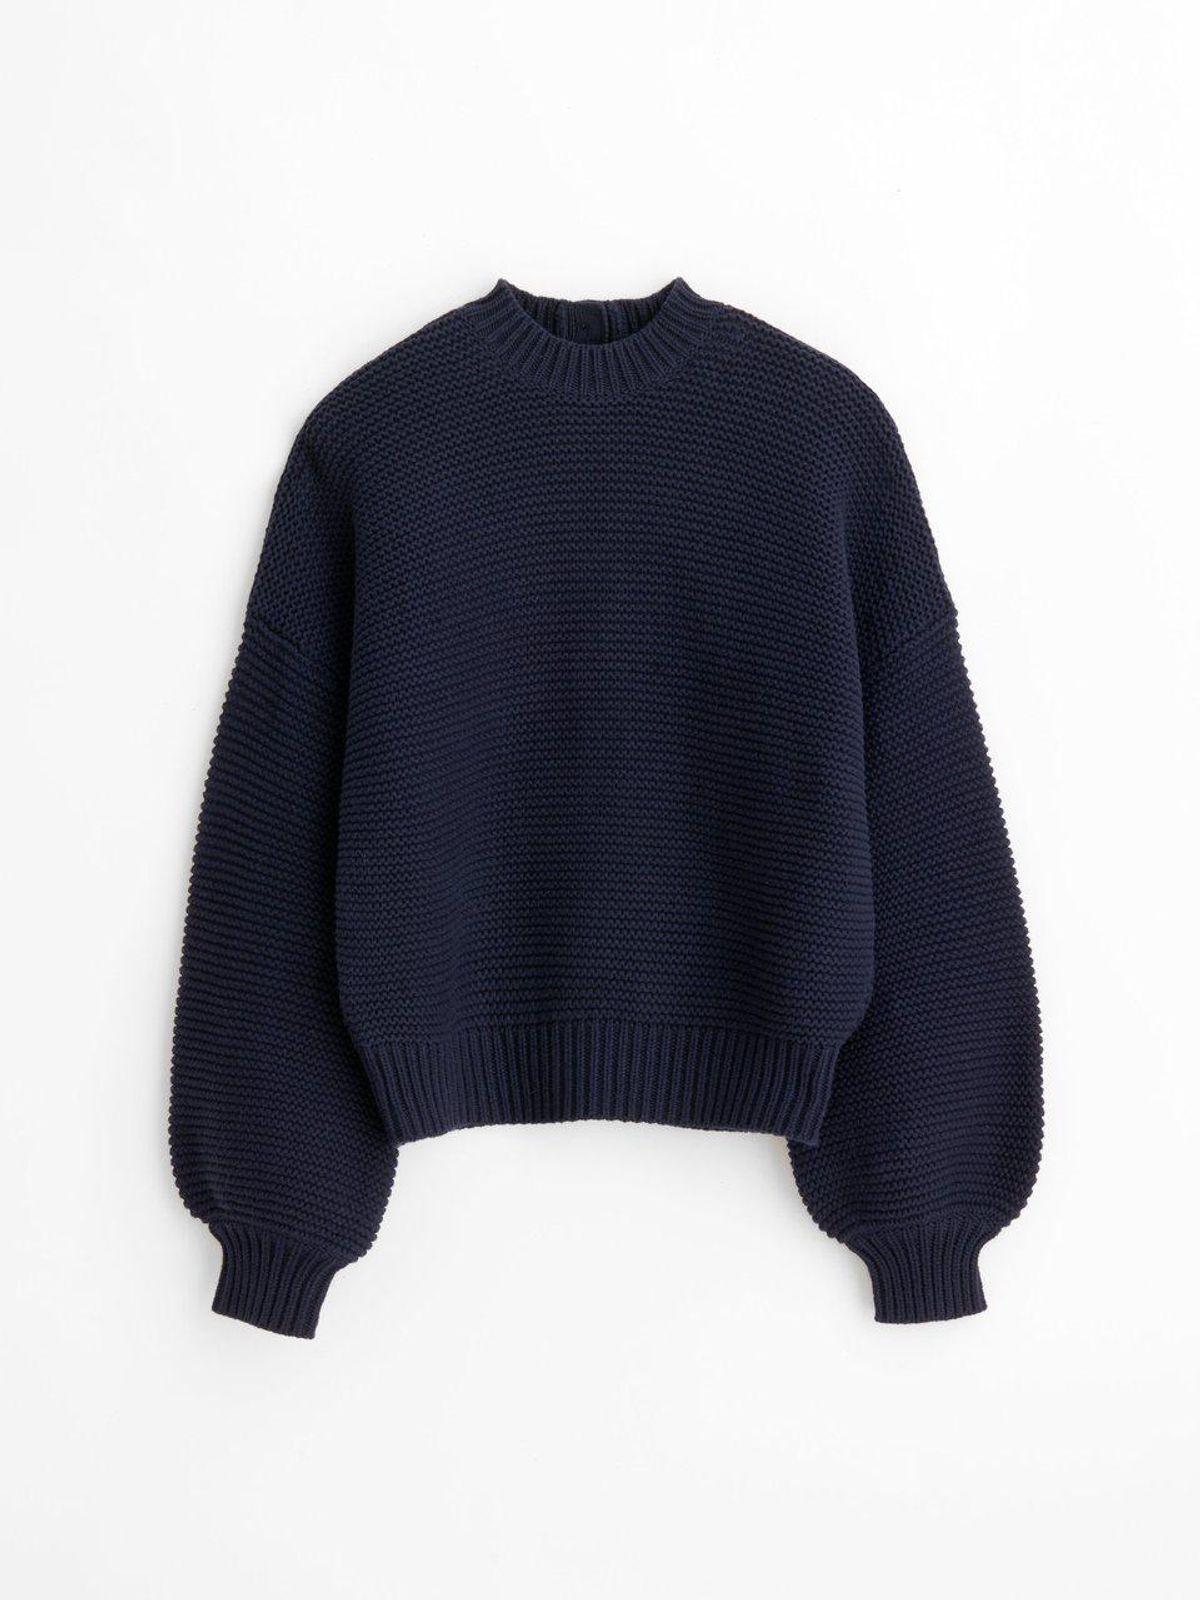 Button Back Crewneck Sweater